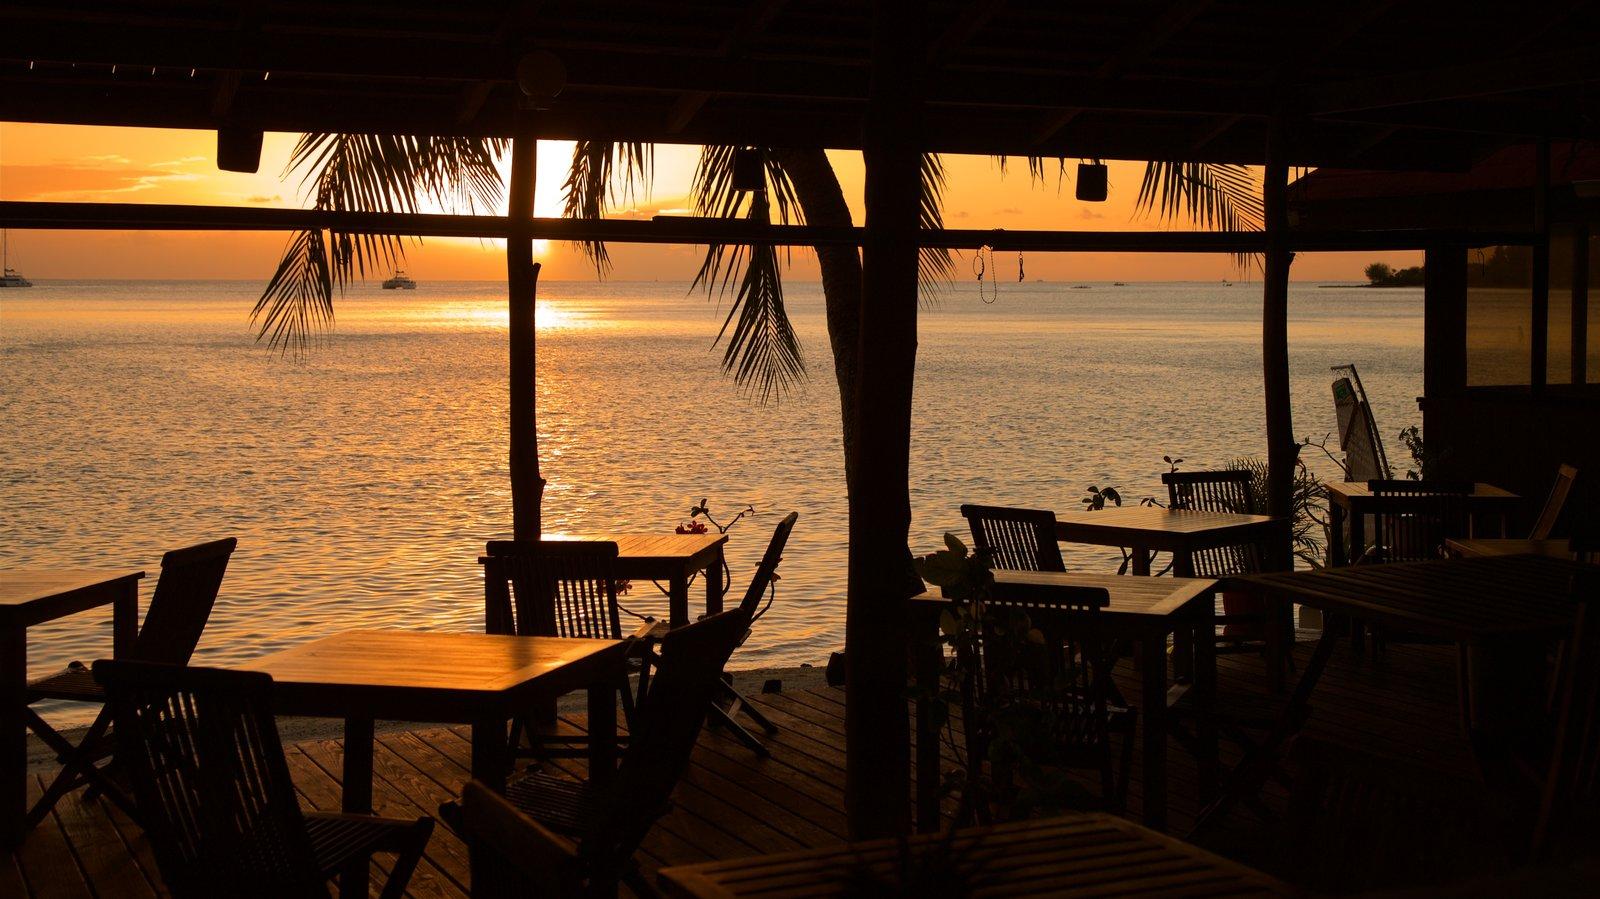 Matira Beach featuring a sunset, general coastal views and interior views